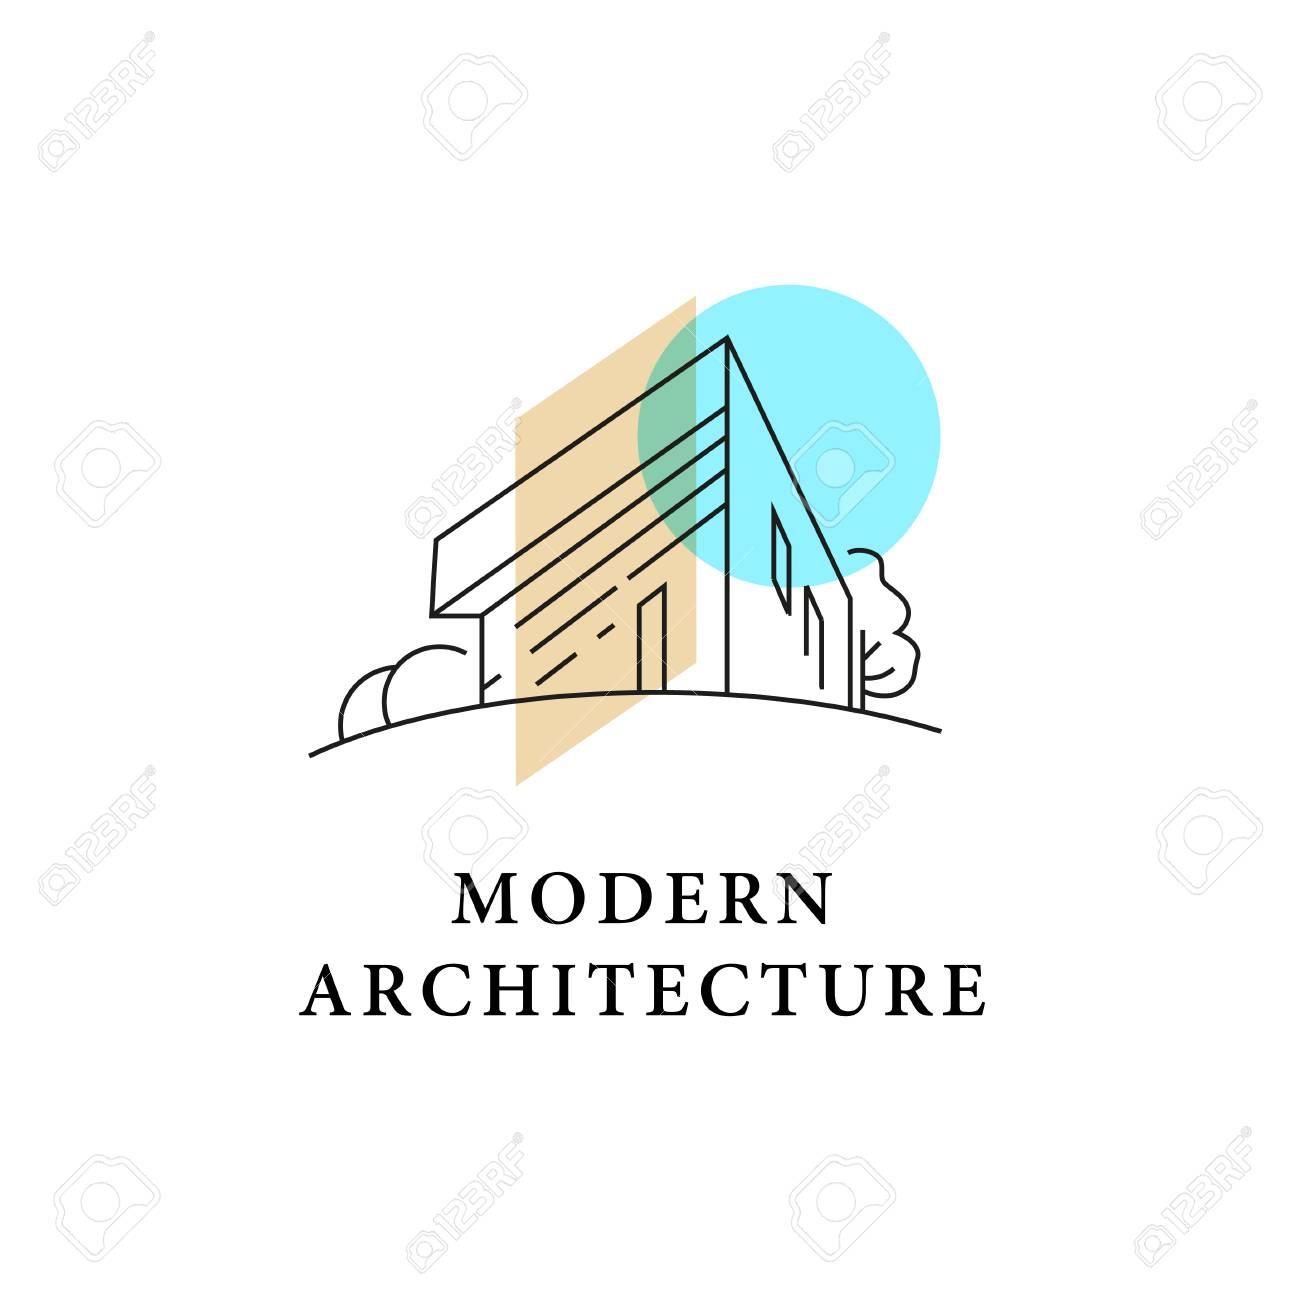 Vector Architect Studio Design Isolated On White Background ...